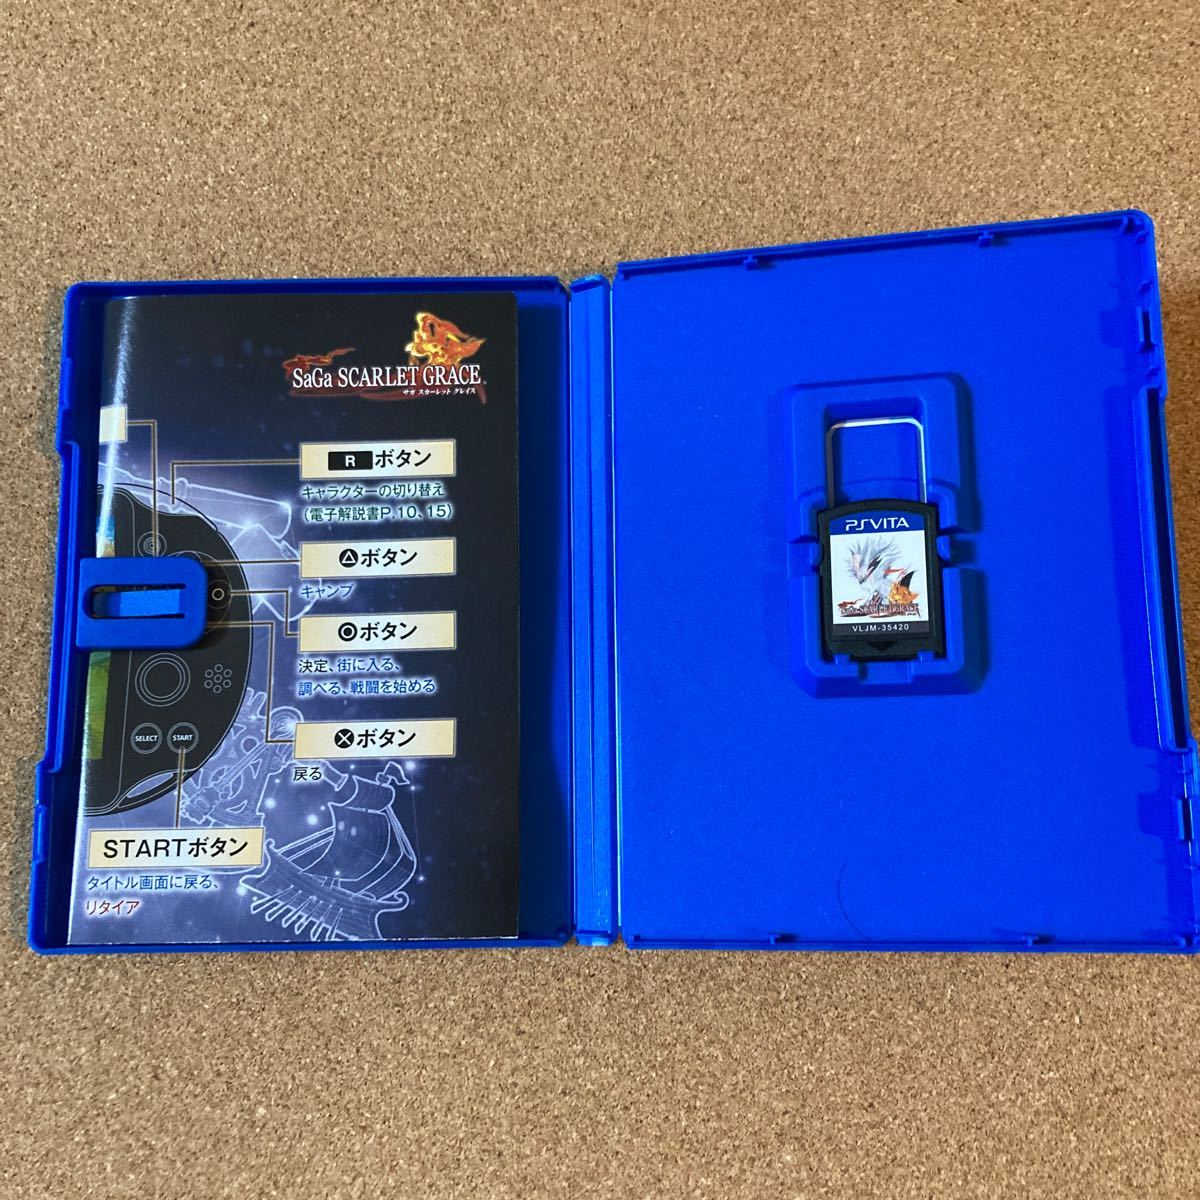 PS Vitaソフト2本